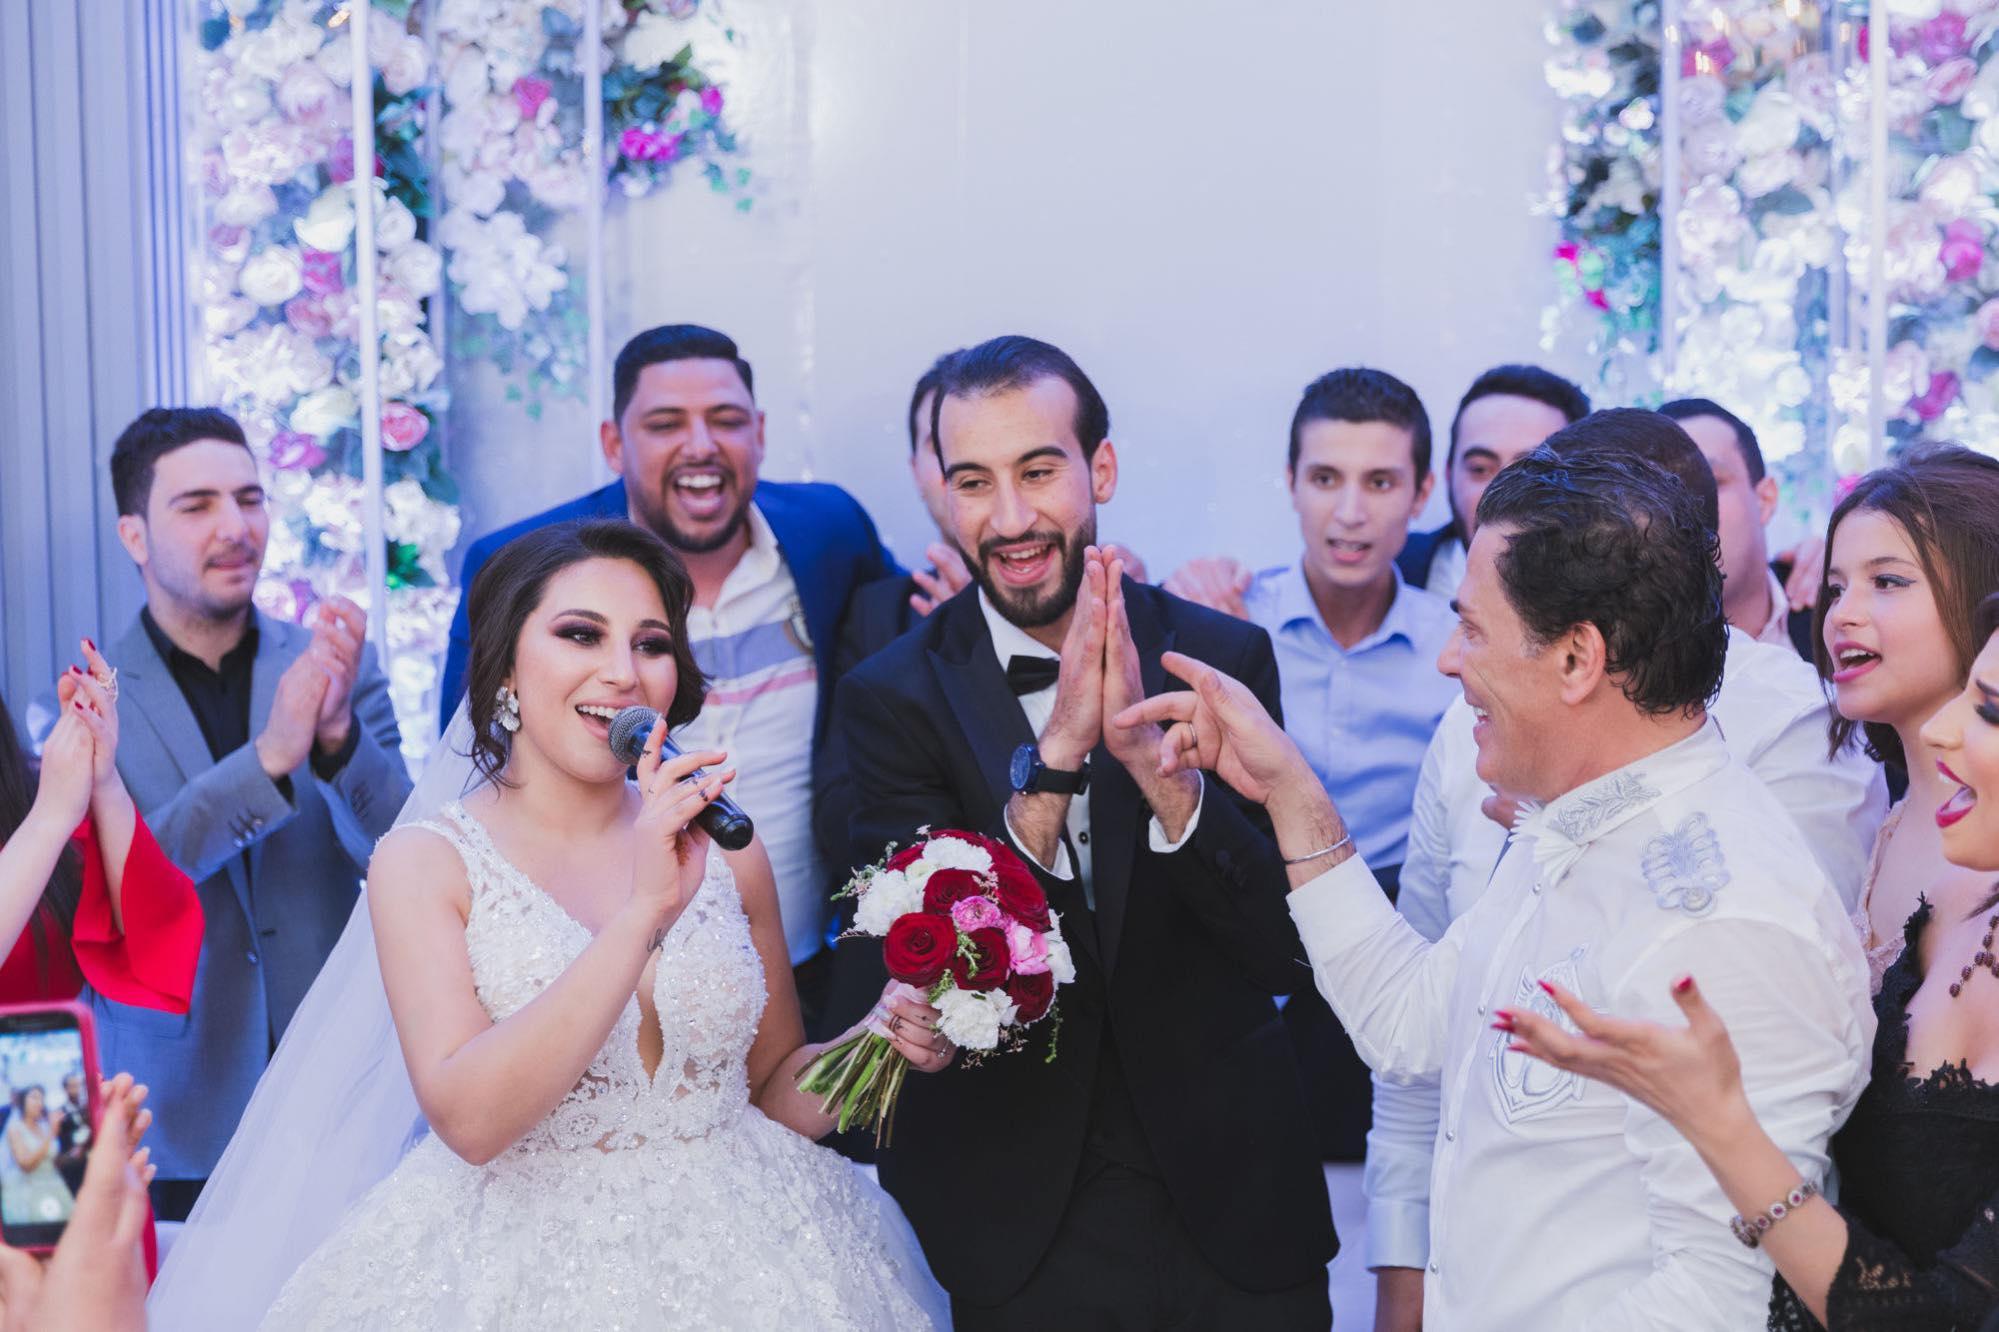 sab_fns9_plus_belles_mariées_tunisiennes